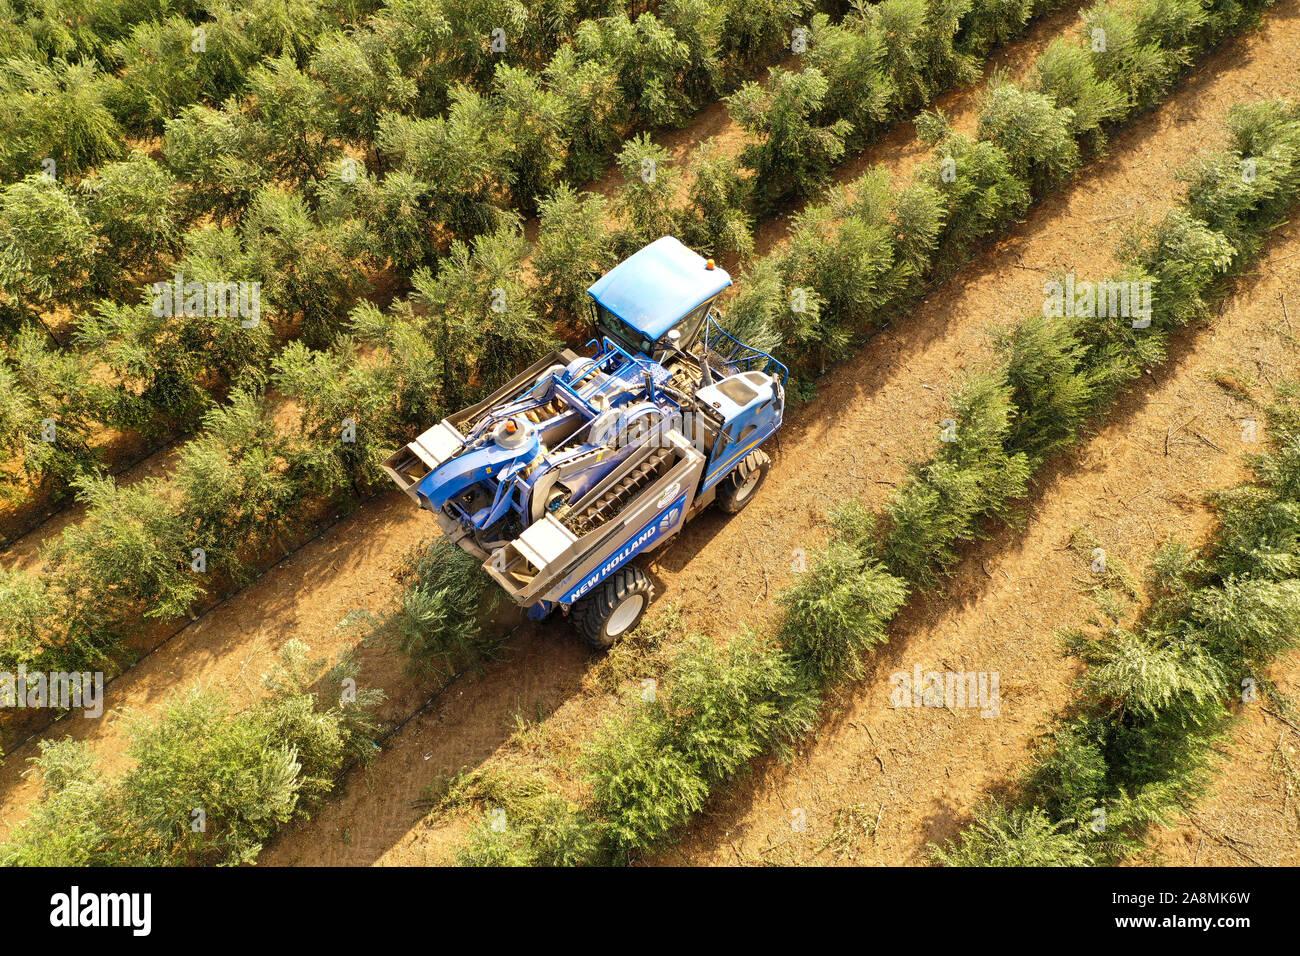 New Holland Feldhäcksler Olivenöl arbeiten in einem Feld, Luftbild. Stockfoto